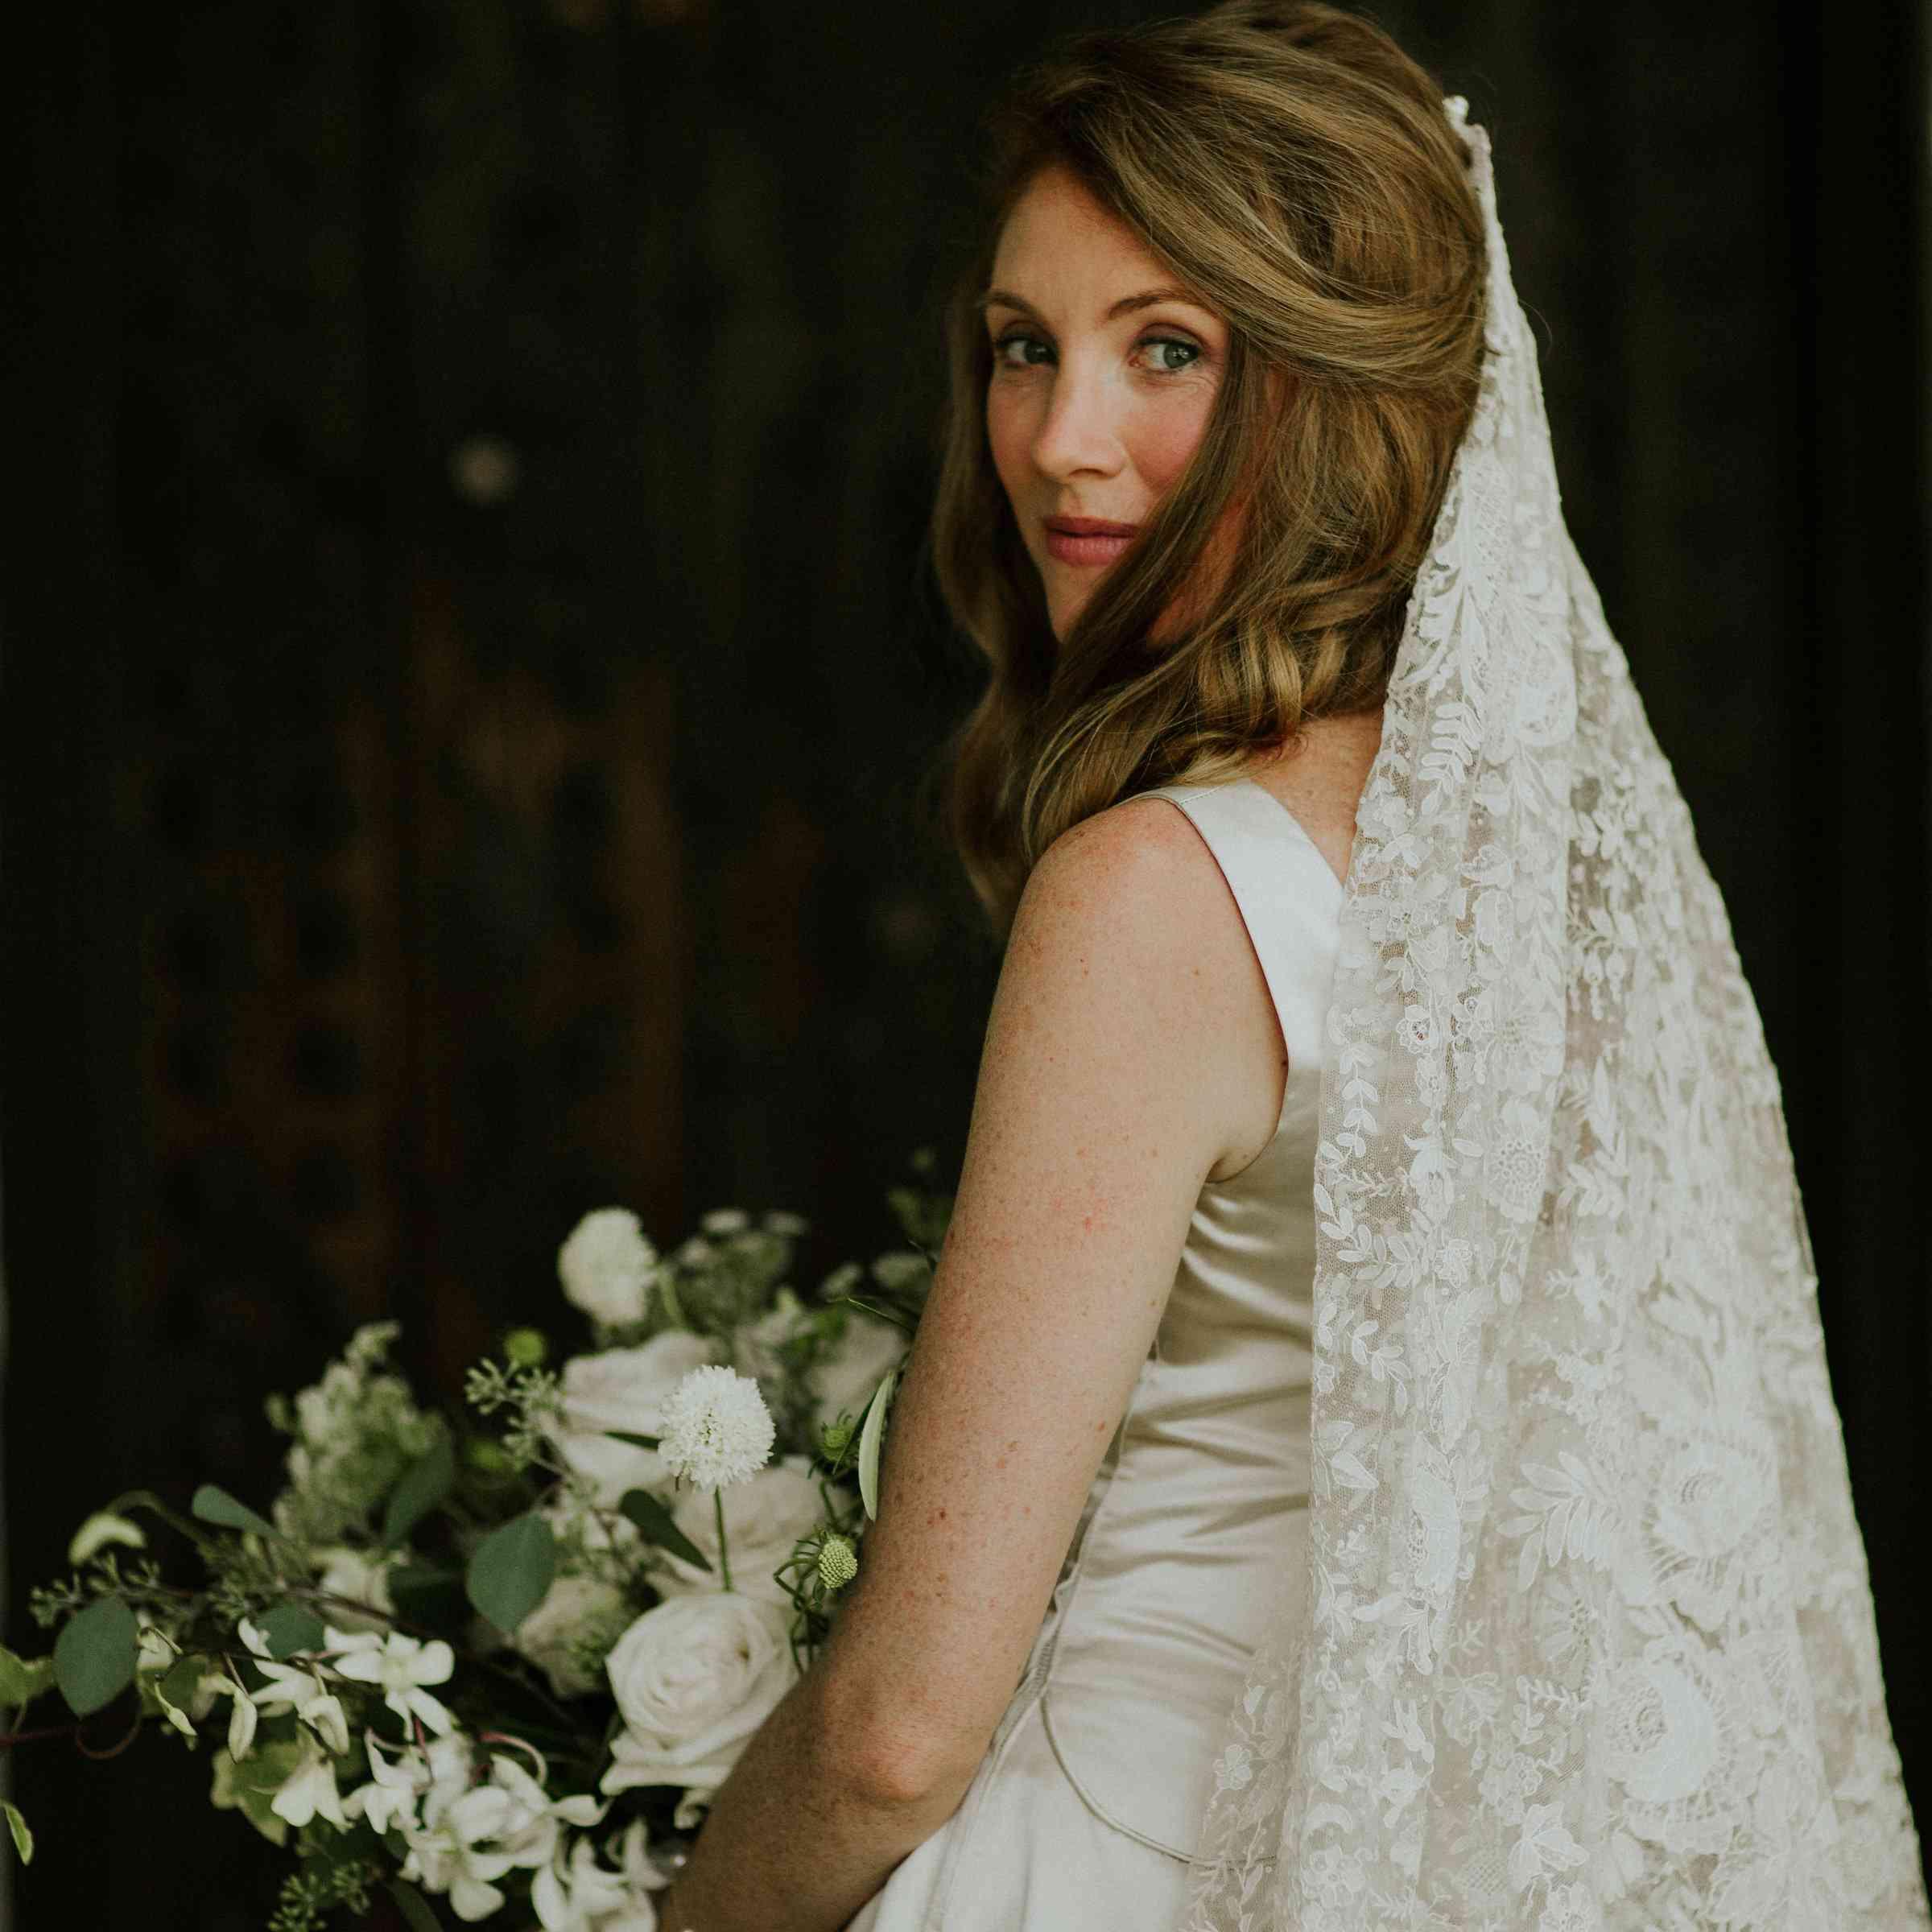 Bride in Vintage Dress